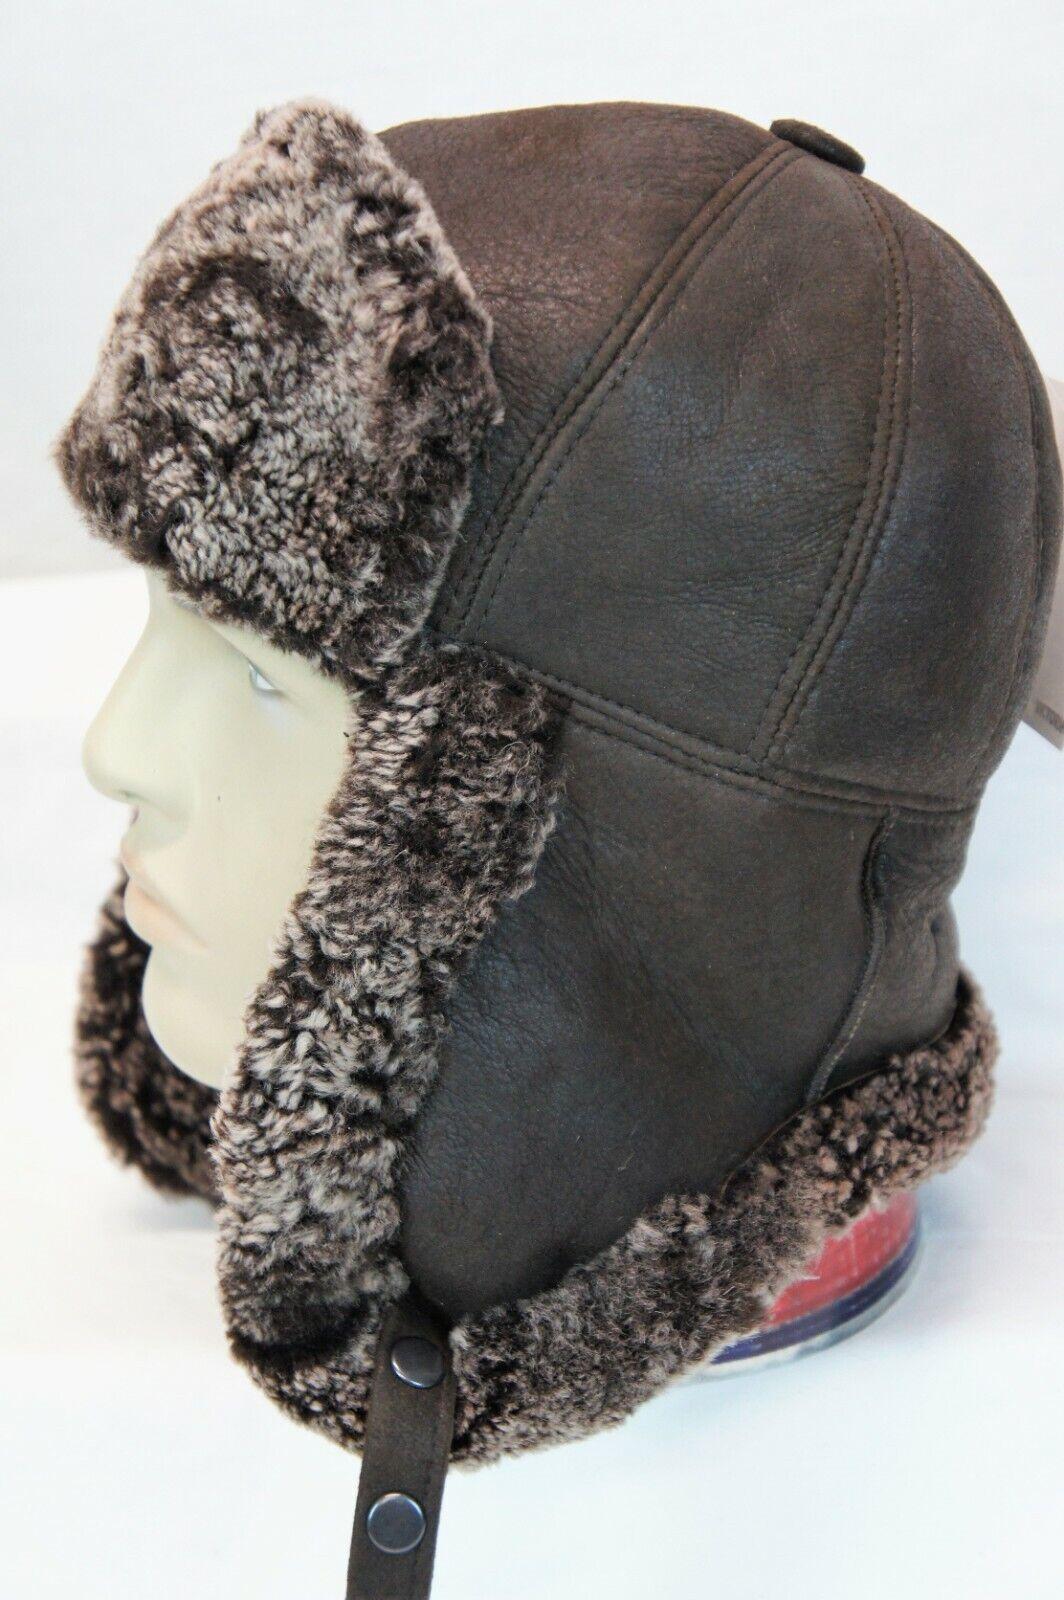 Real Sheepskin Shearling Leather Bomber Trapper Ushanka Hunting Fur Hat M-3XL